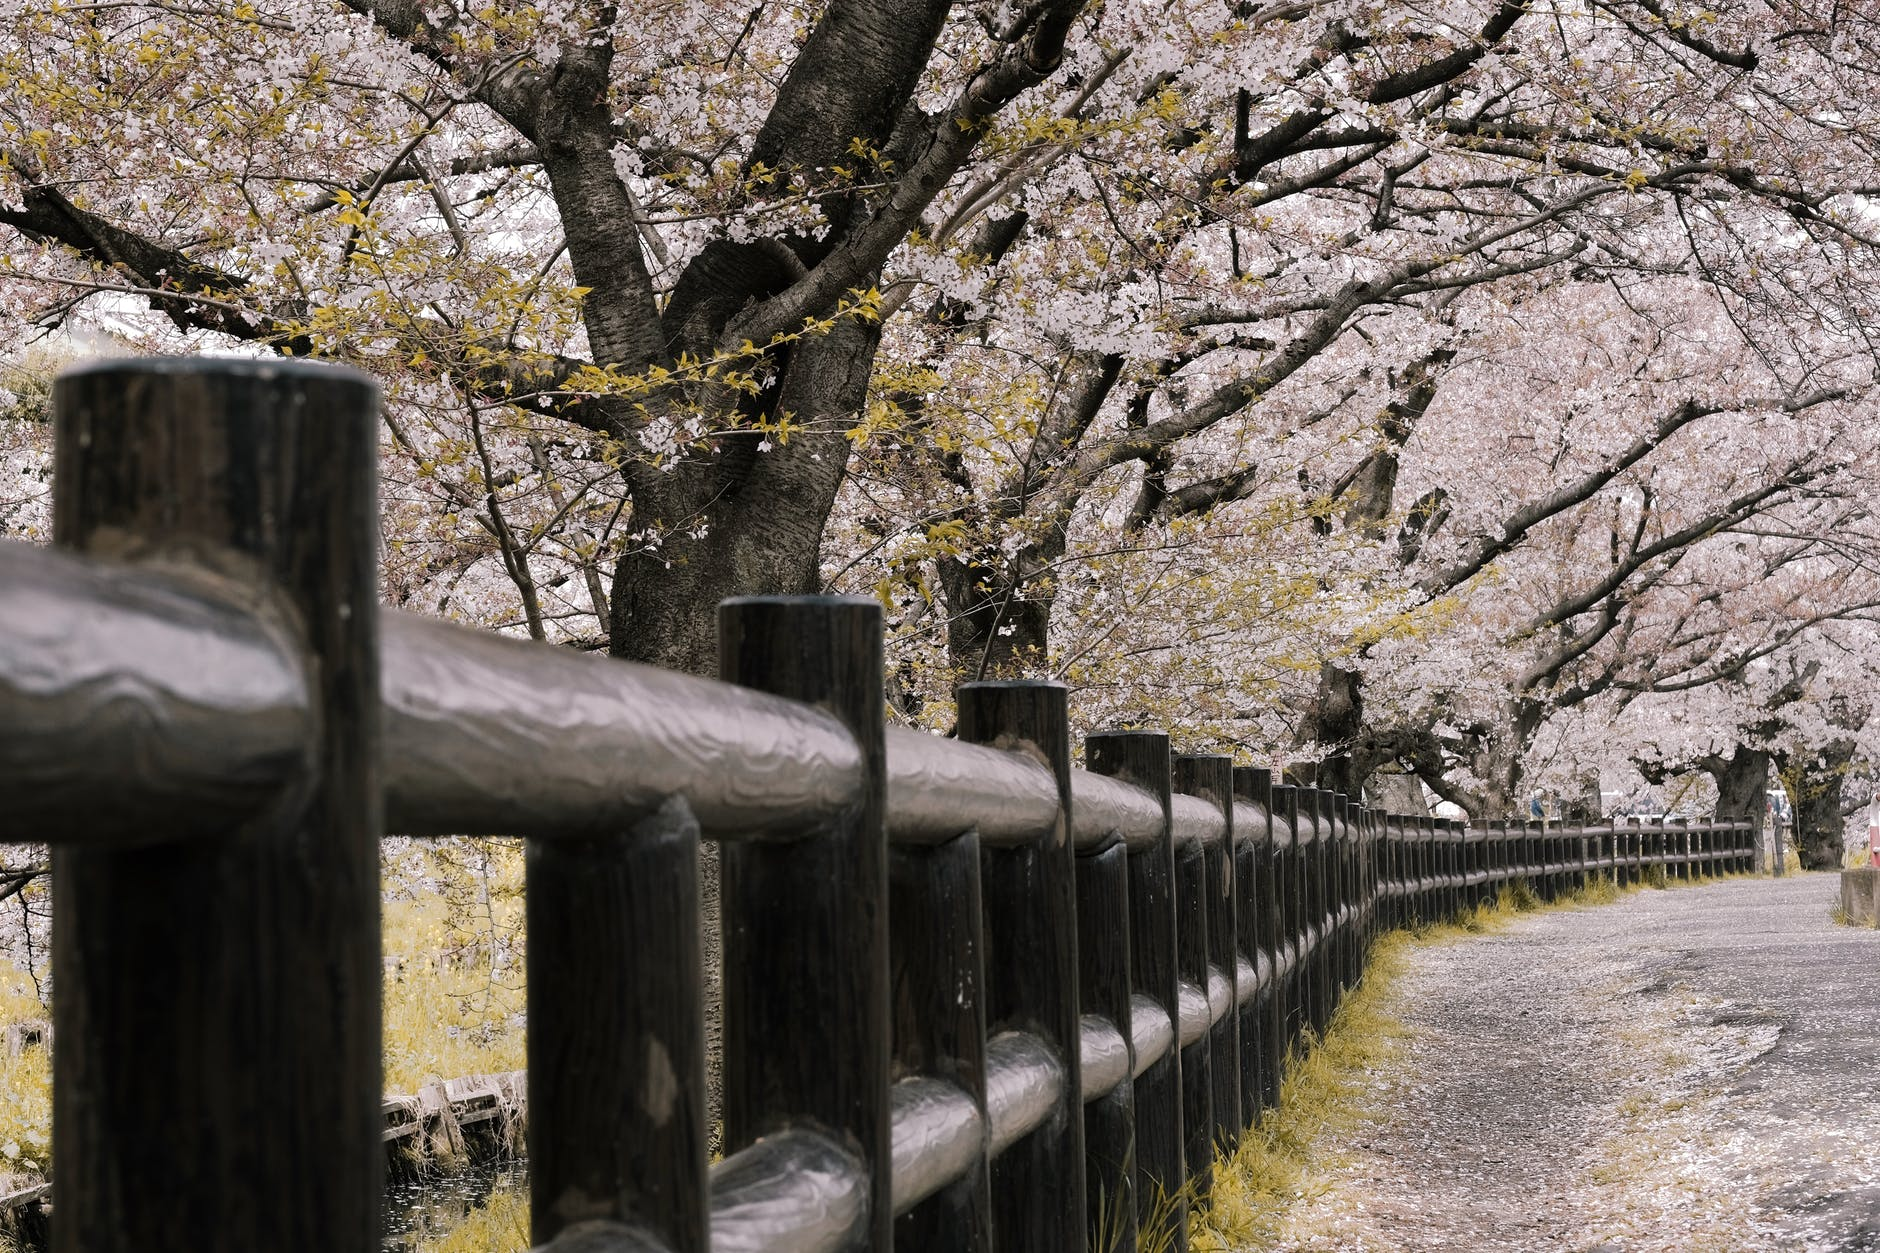 black wooden railing